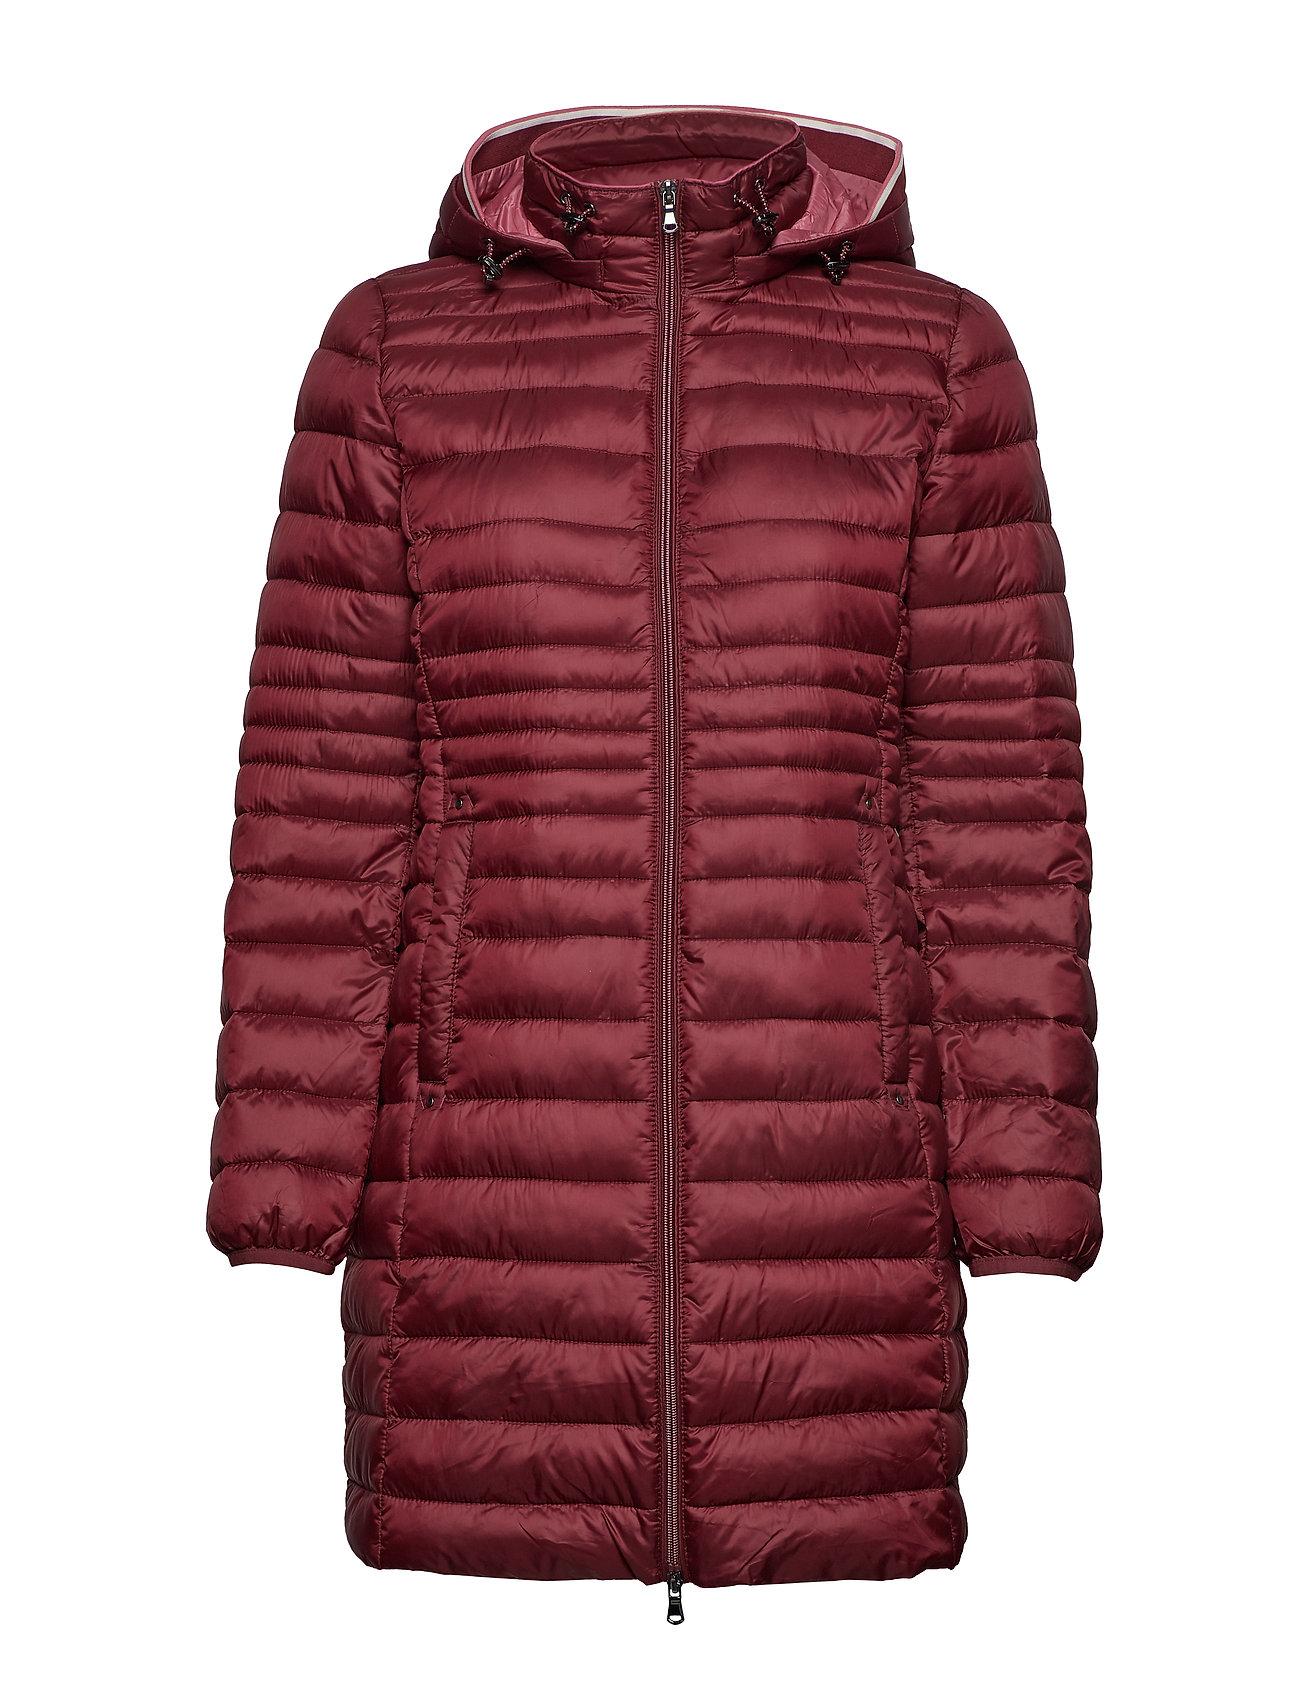 Casual Wovendark Wovendark Coats RedEsprit Coats RedEsprit Coats Casual UqMVLSpzG